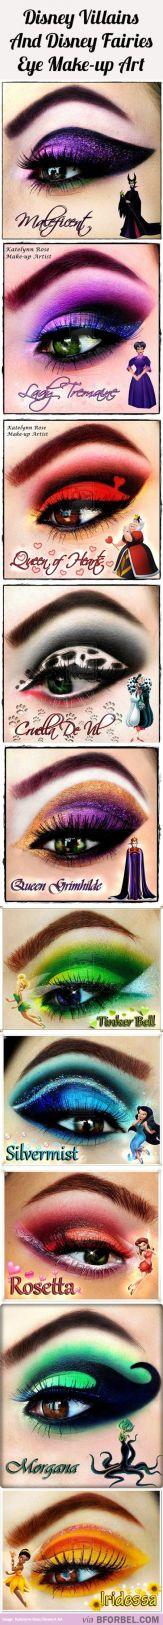 10 Disney Villains And Fairies Inspired Beautiful Eye Makeup...: